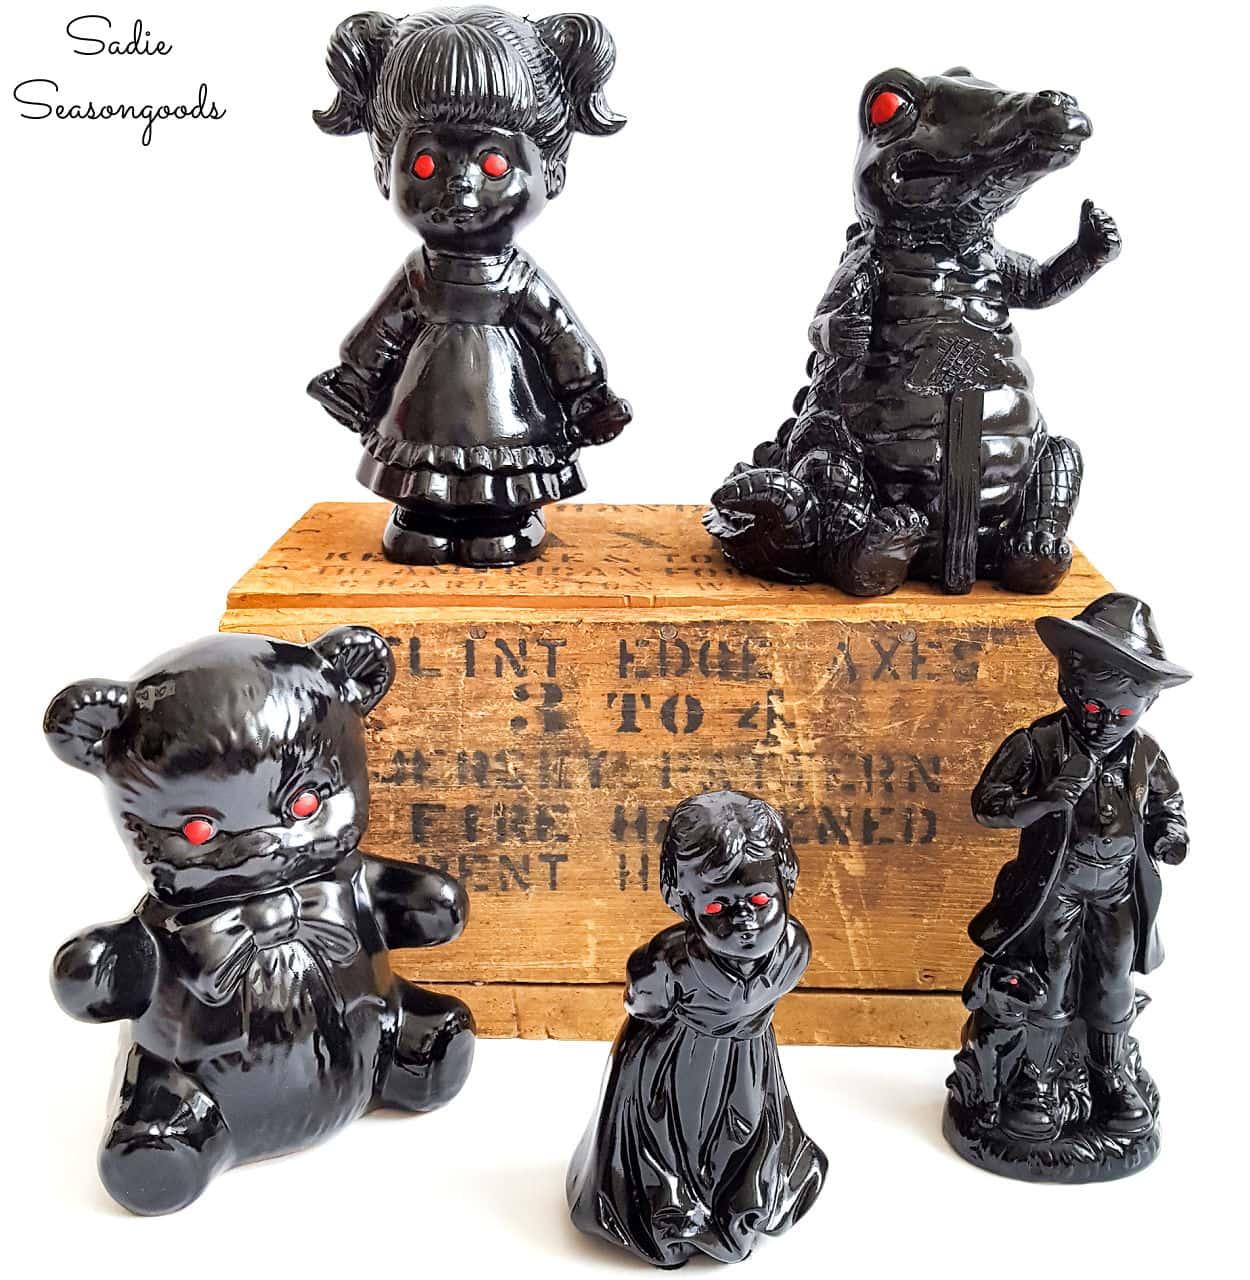 Halloween Figurines for Spooky Decor